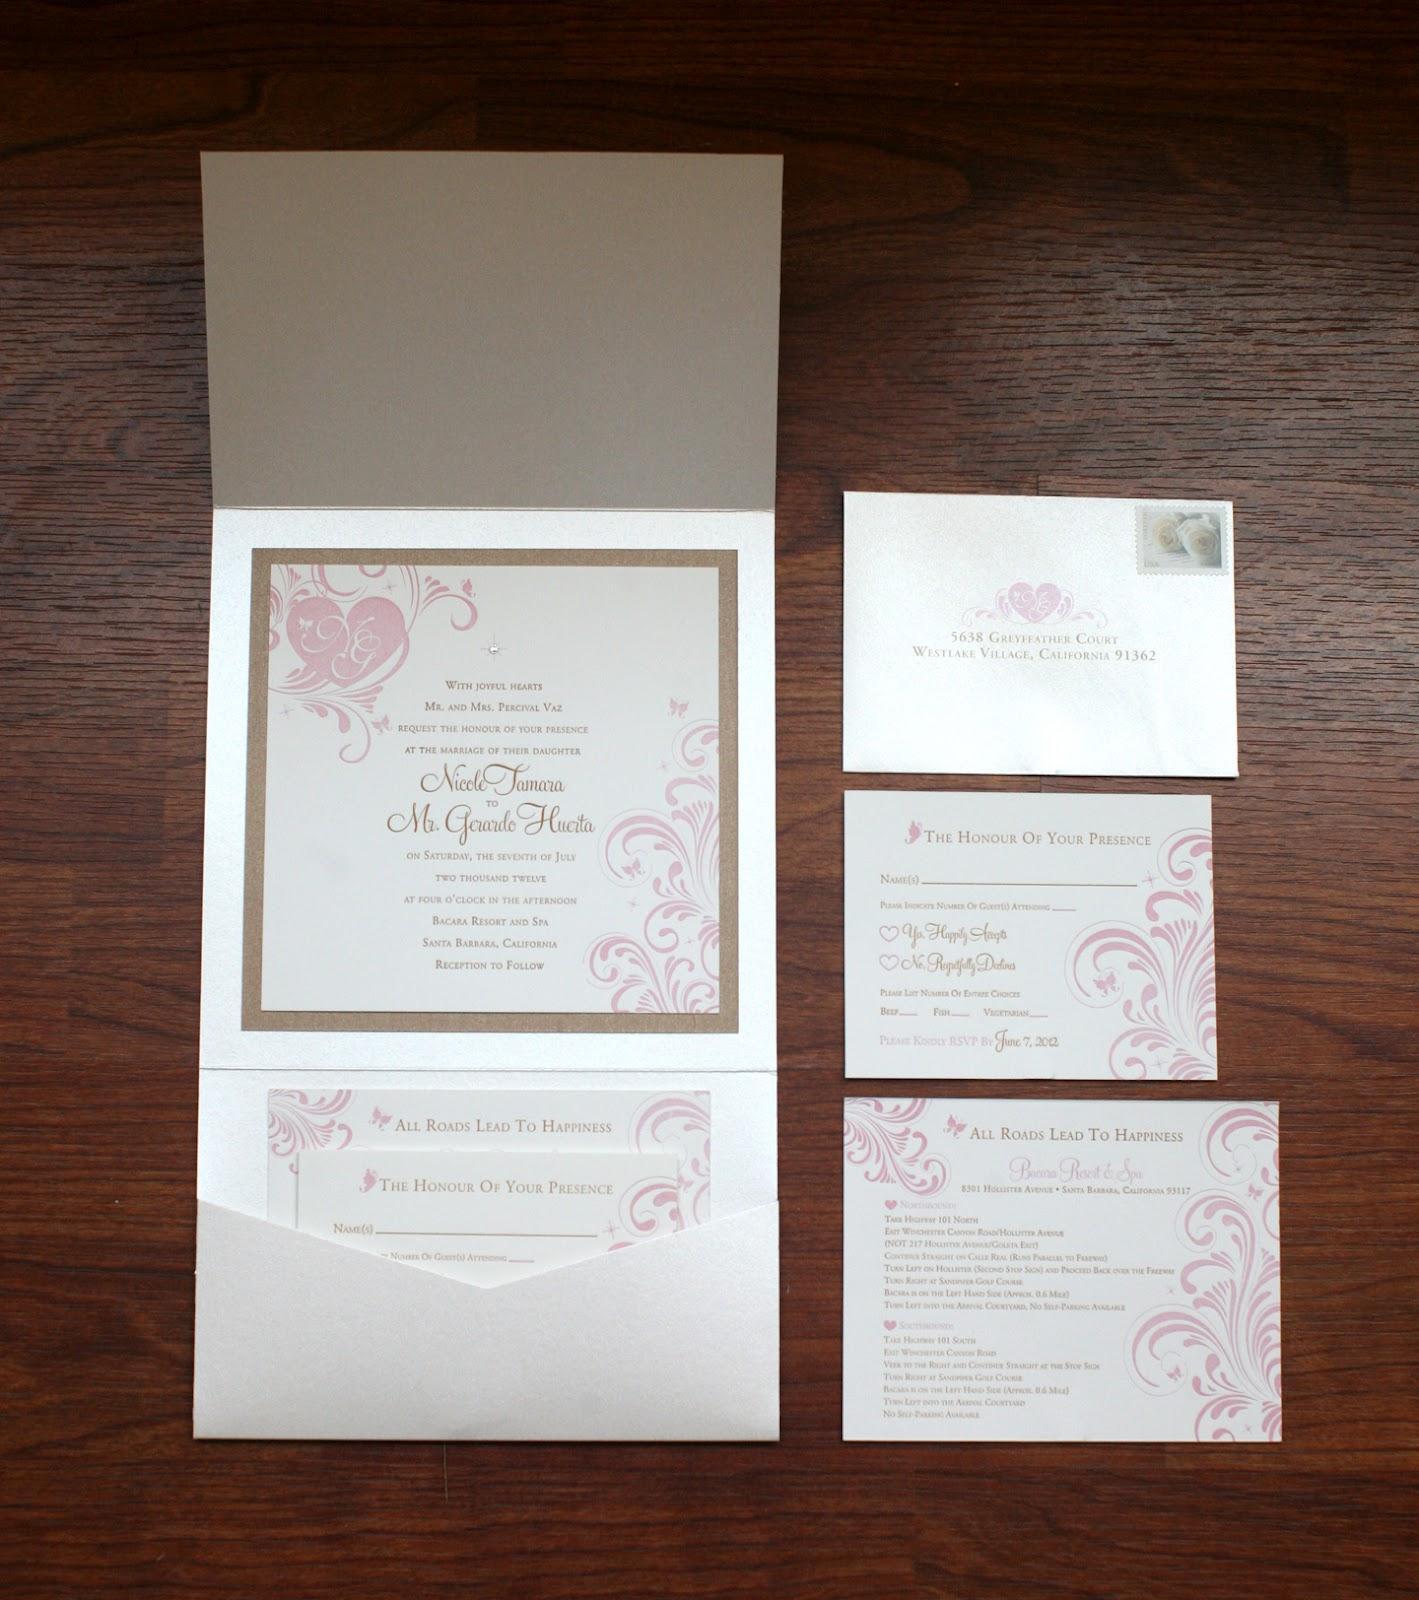 custom wedding letterpressed bling wedding invitations Custom Letterpressed Wedding Invitations Pink Hearts Design